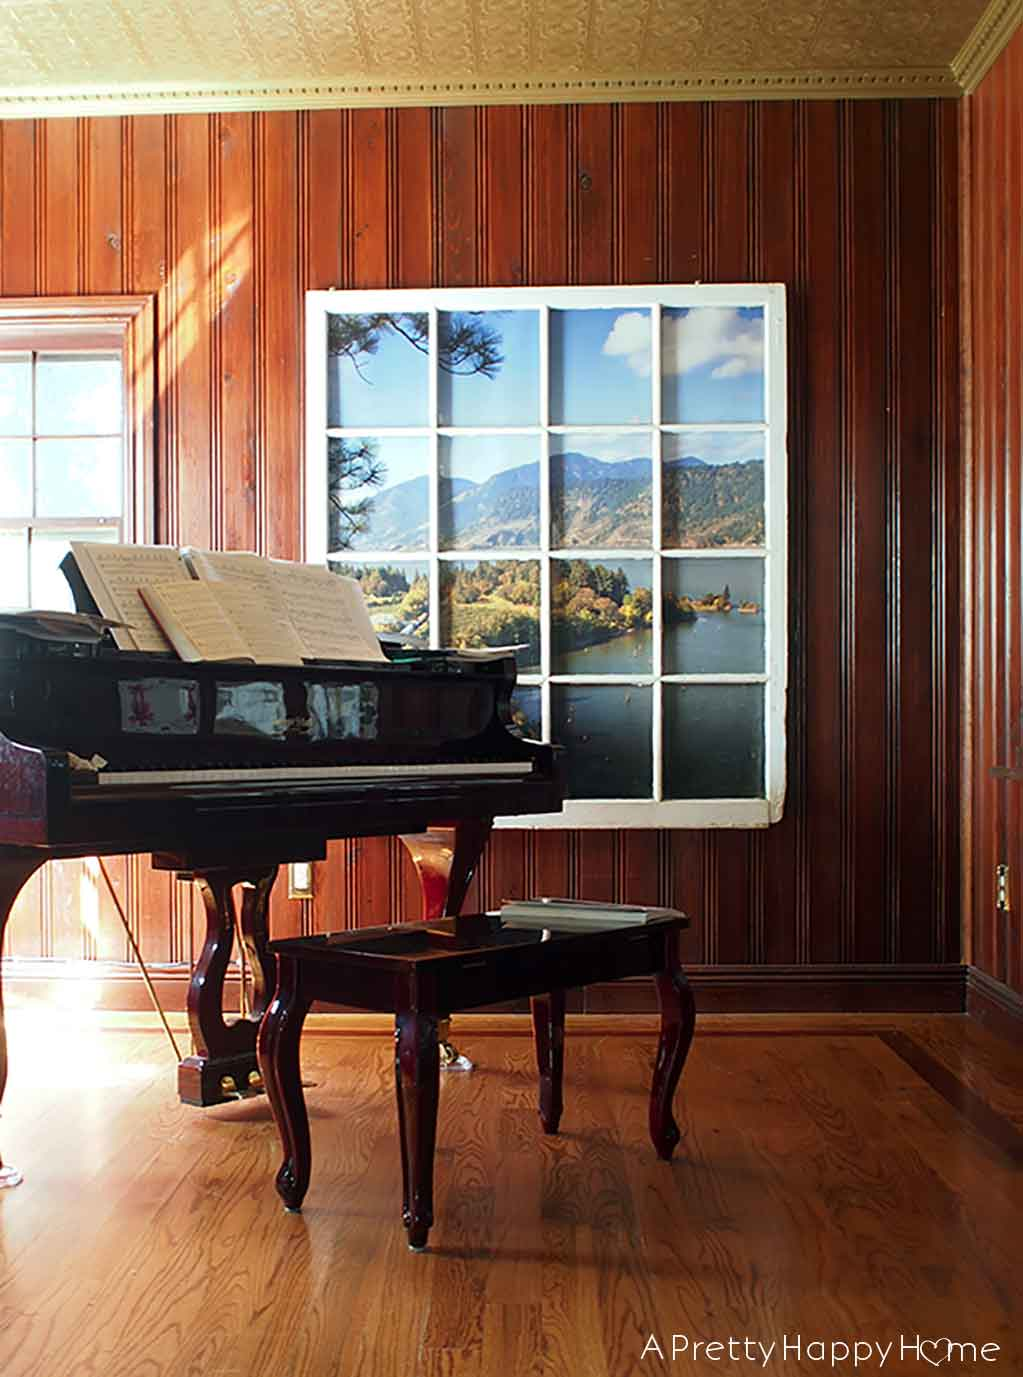 Wood Paneled Game Room: Wood Paneled Piano Room